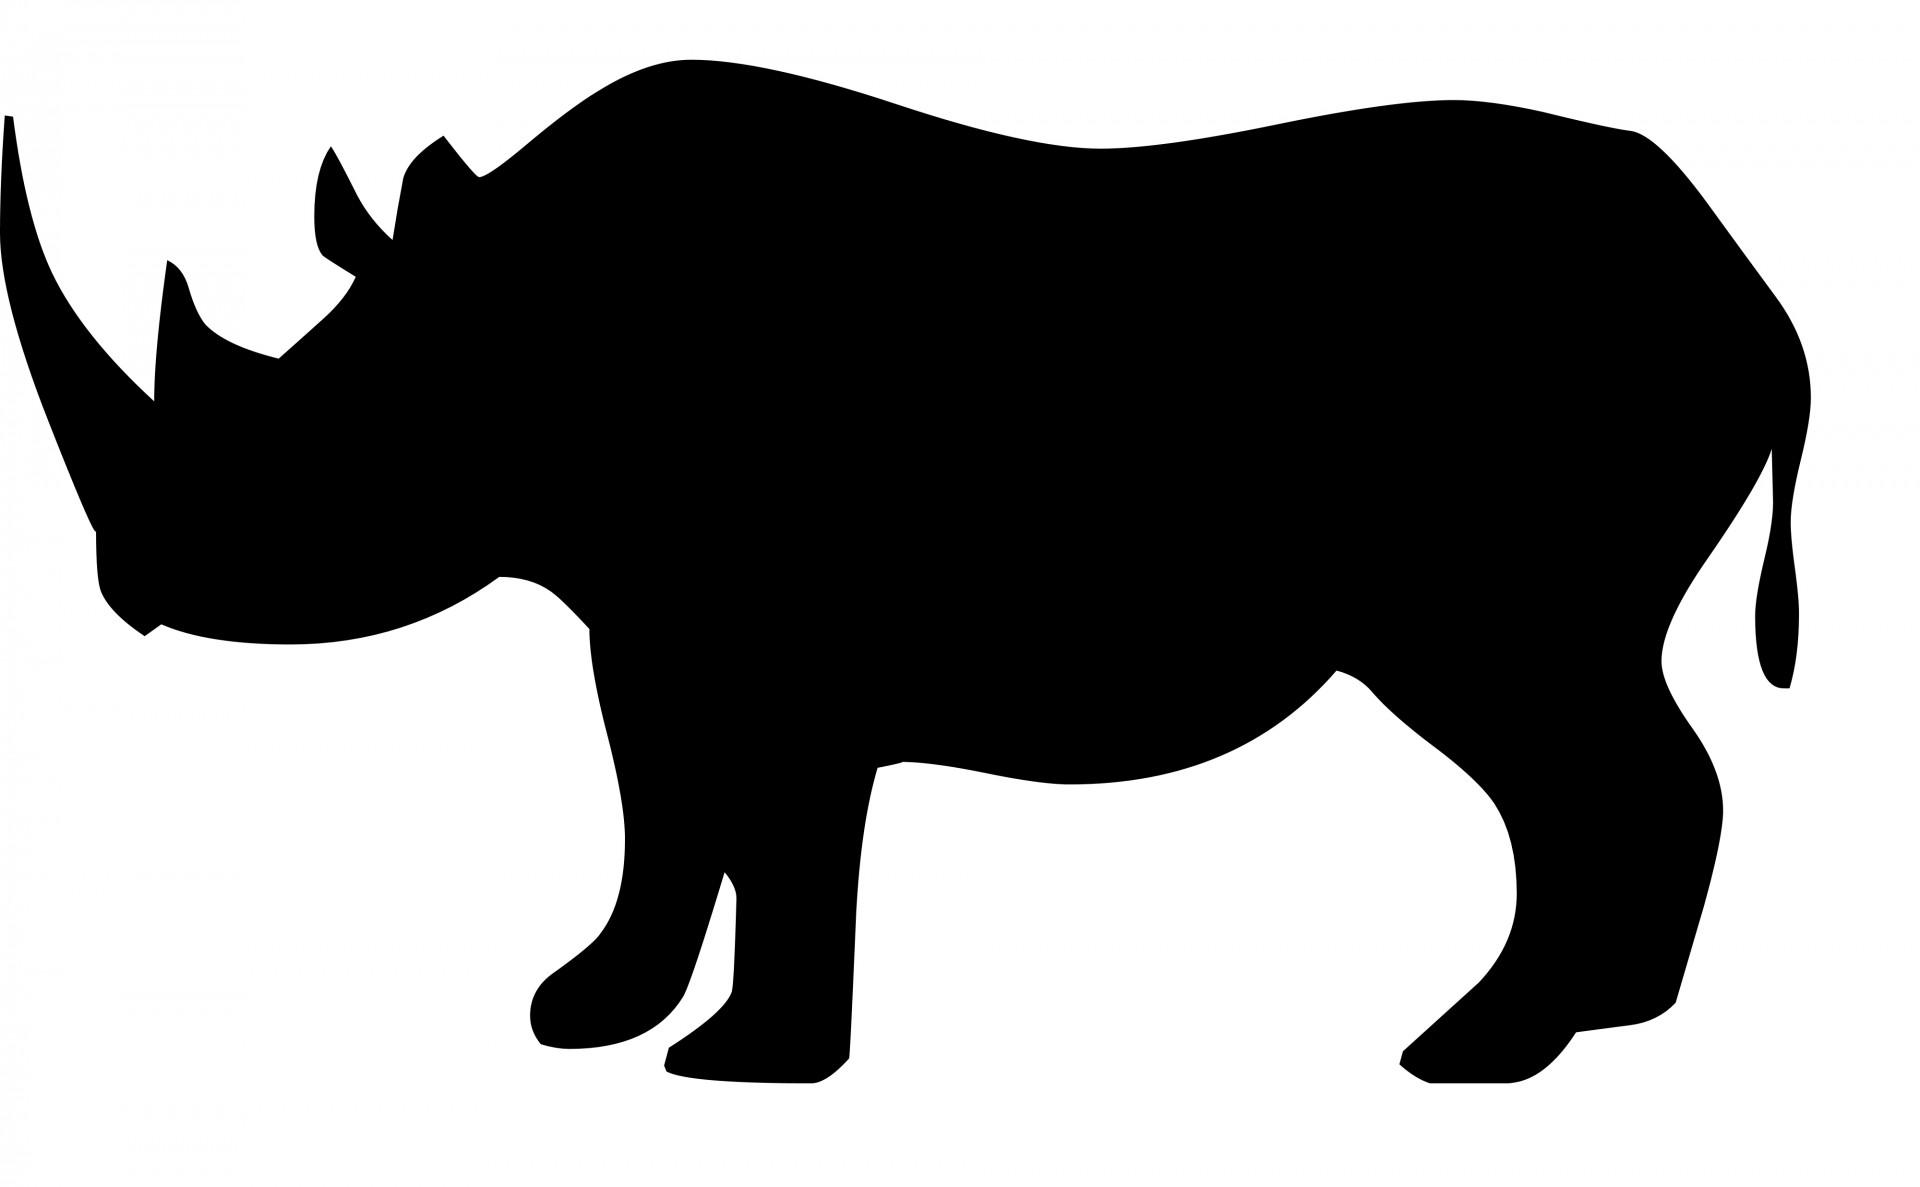 1920x1187 Rhino Silhouette Free Stock Photo